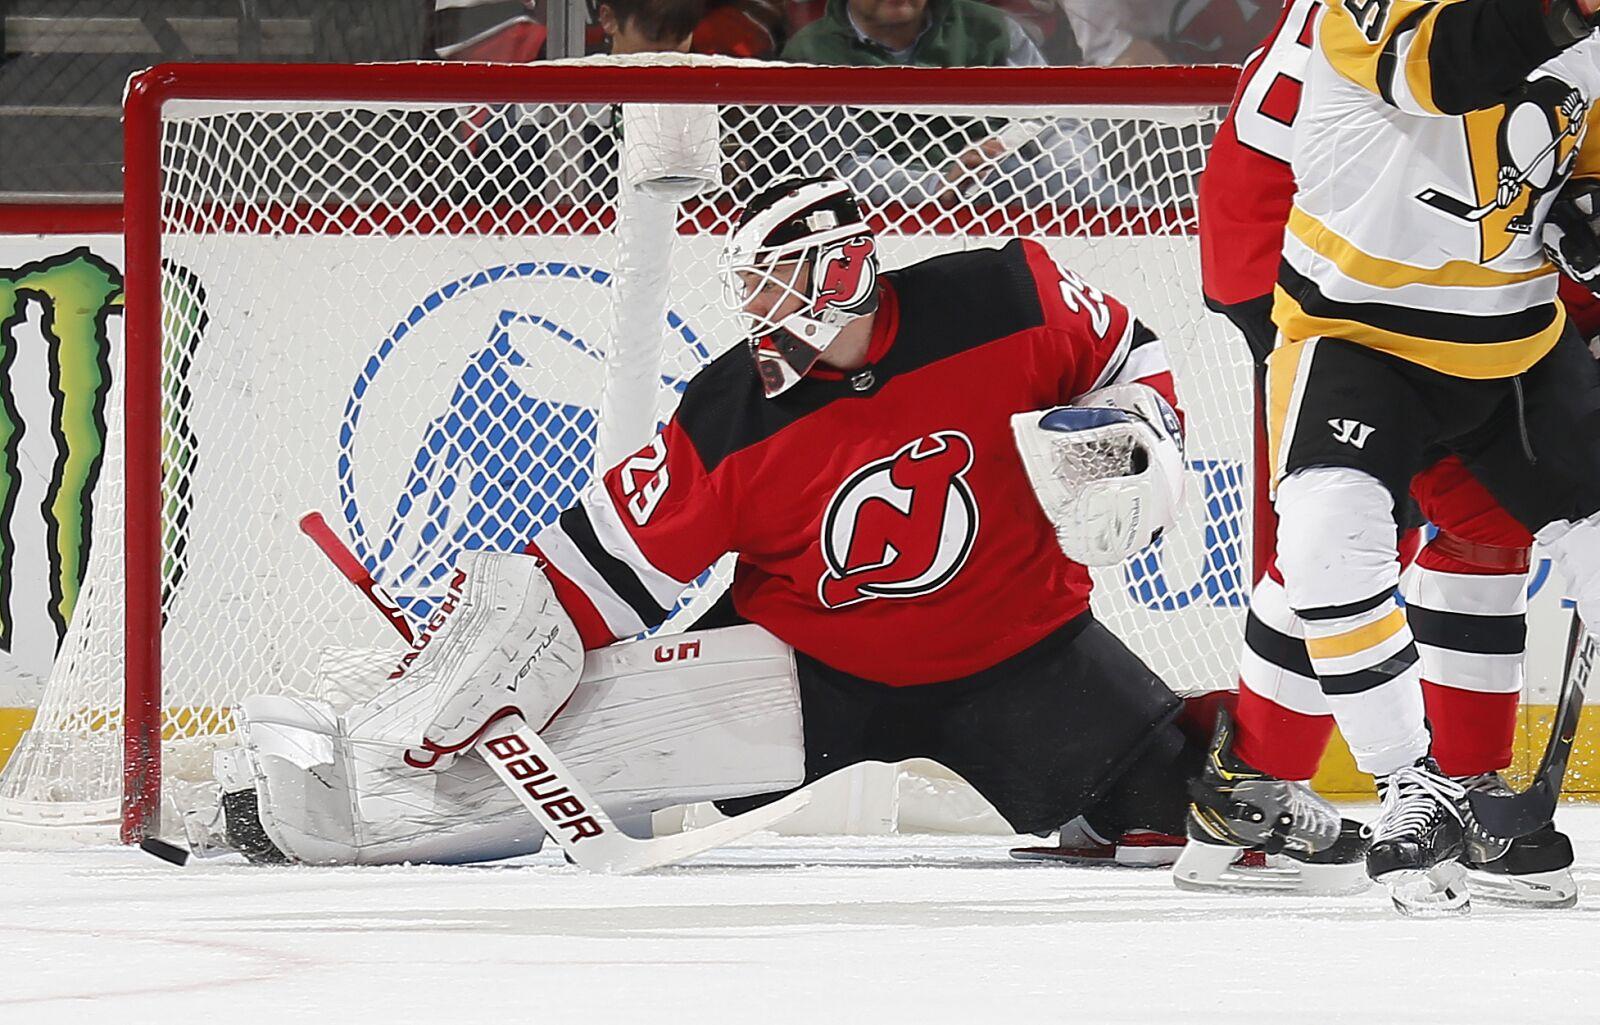 Devils: MacKenzie Blackwood Shines In Win Over Penguins